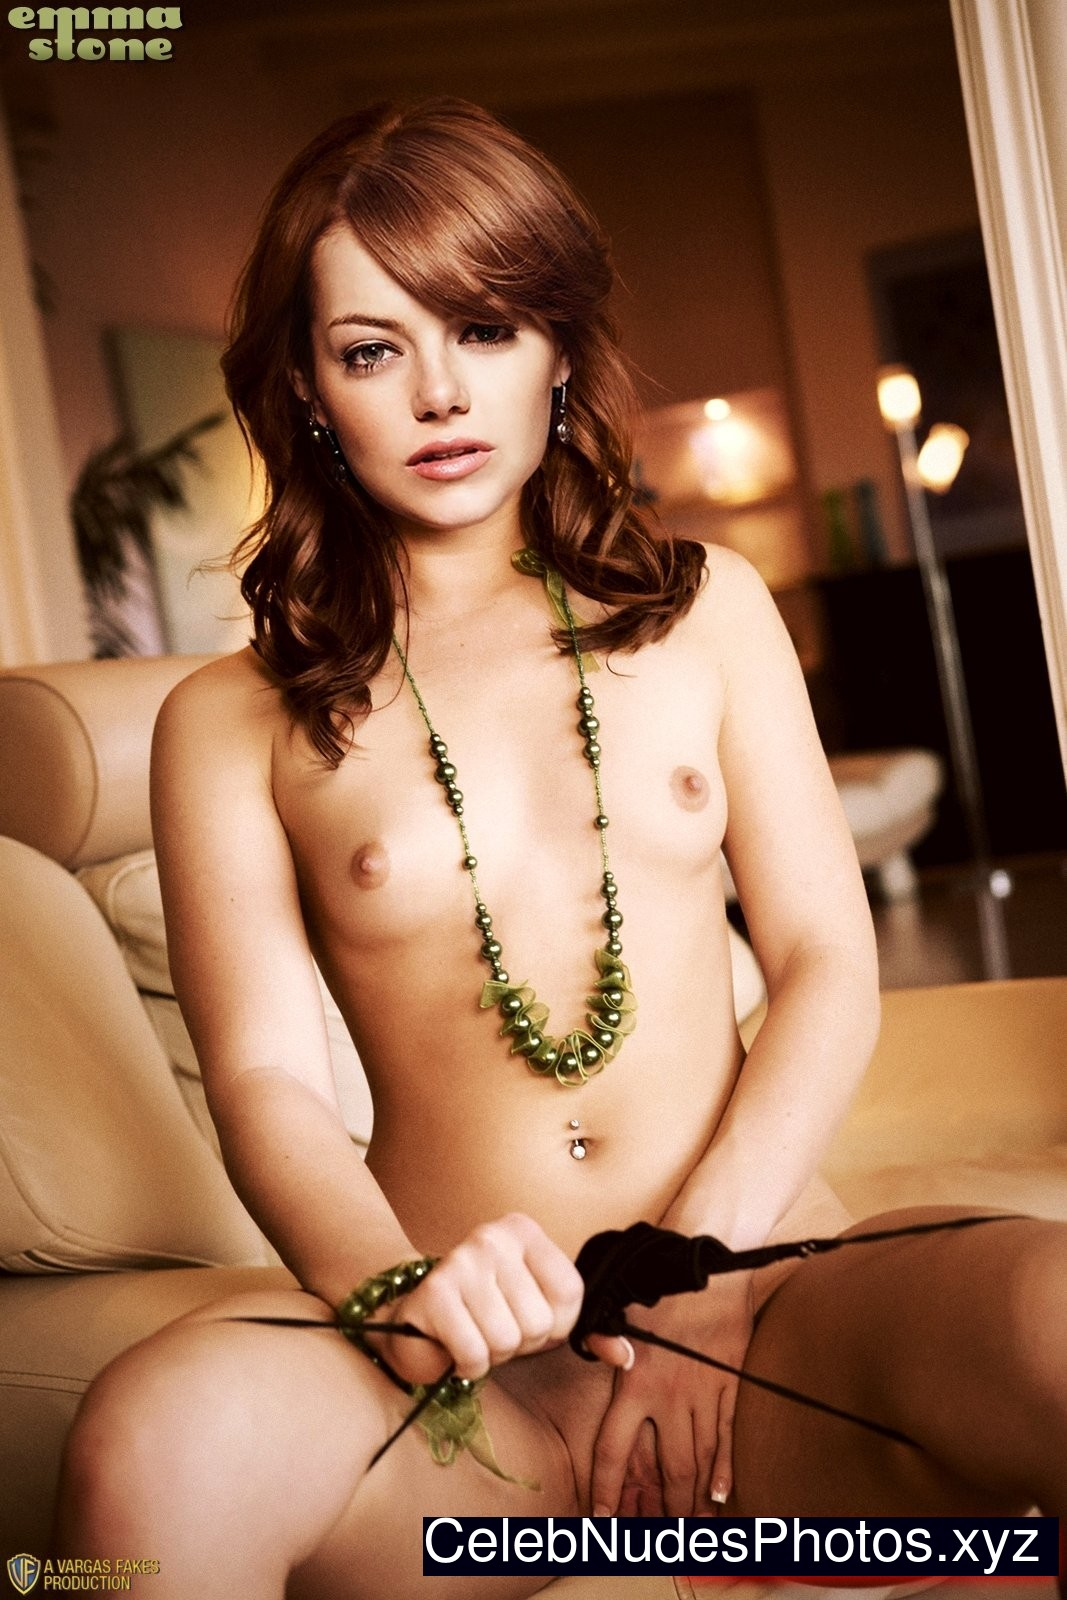 emma stone nude real